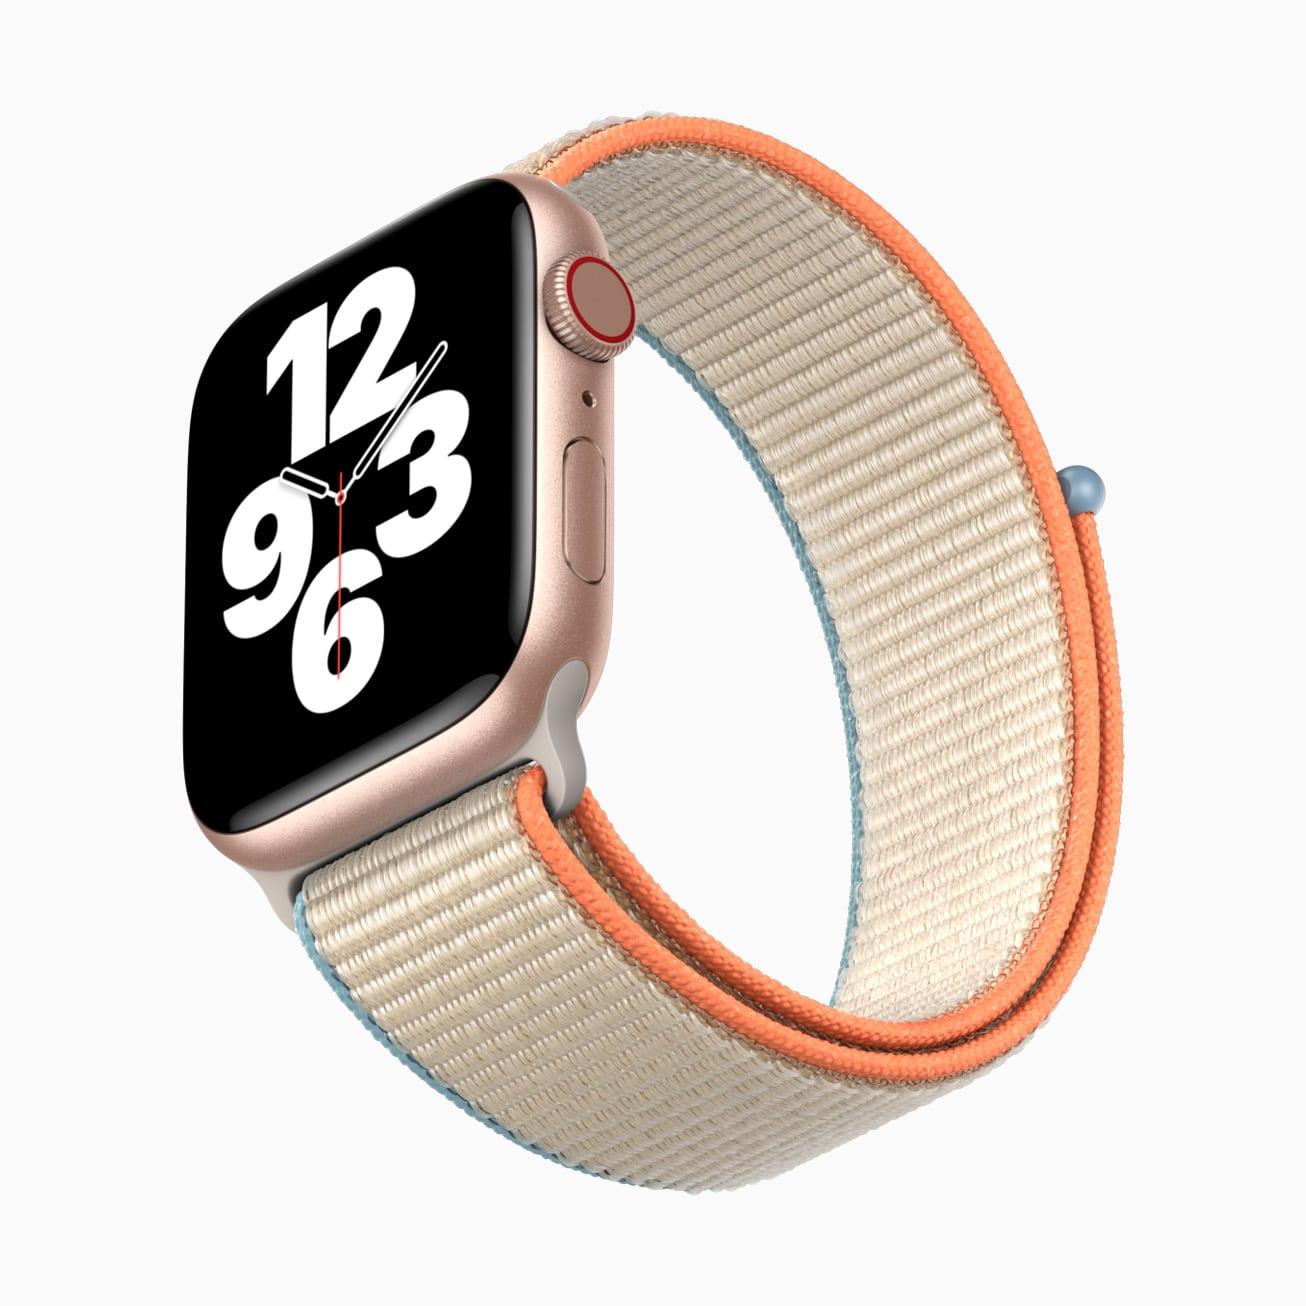 Apple Watch SE com pulseira esportiva de nylon laranja